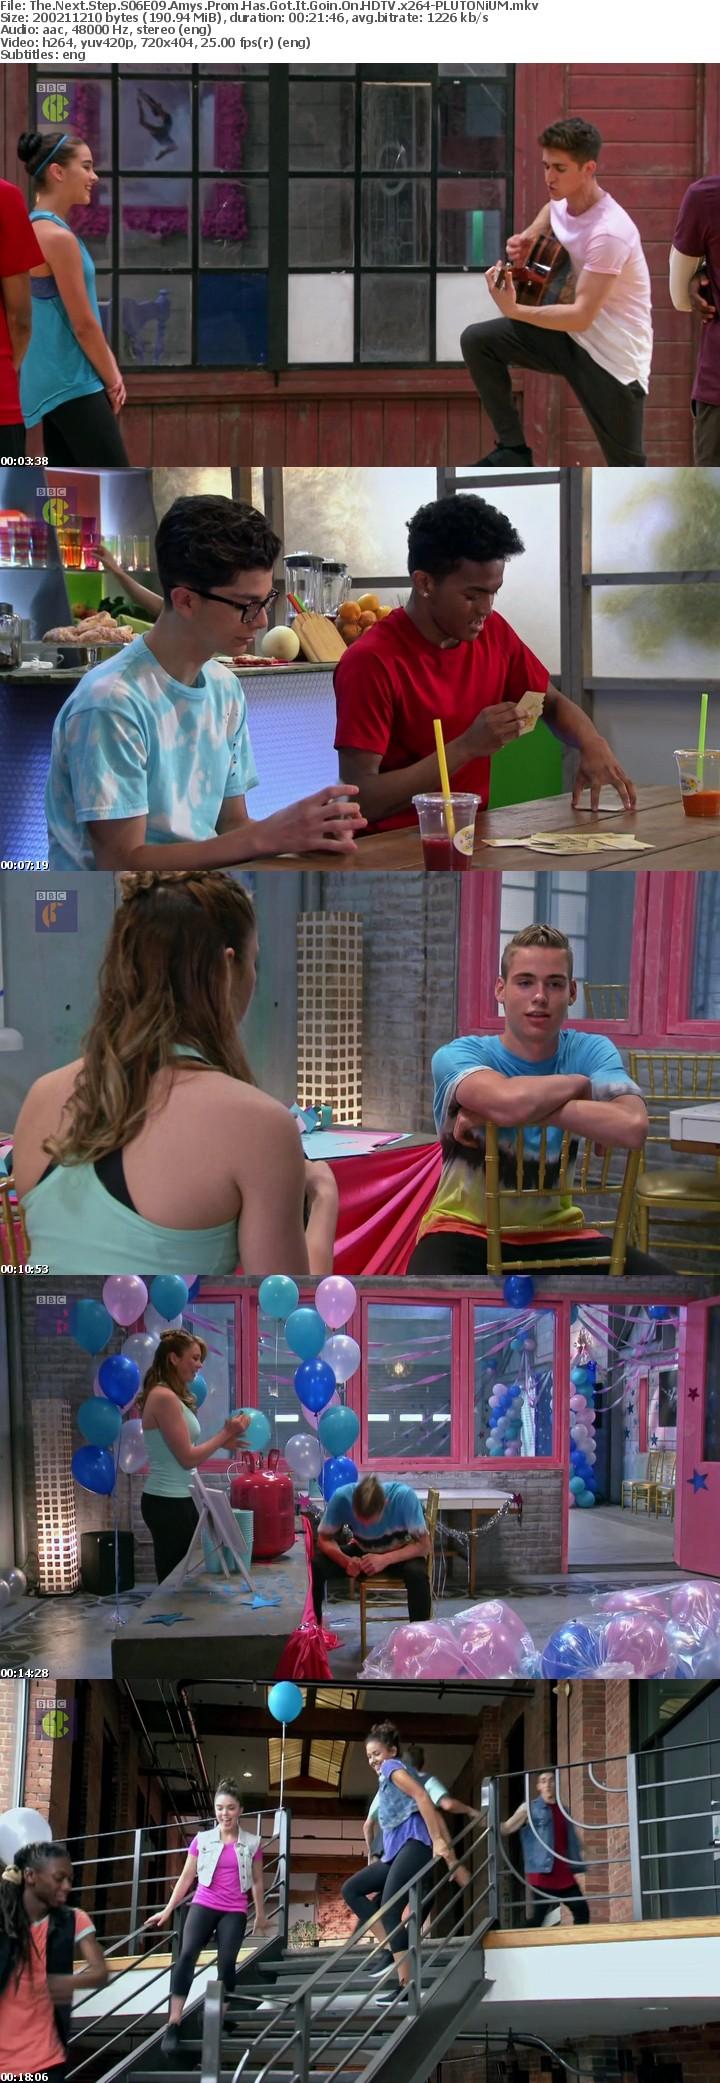 The Next Step S06E09 Amys Prom Has Got It Goin On HDTV x264-PLUTONiUM